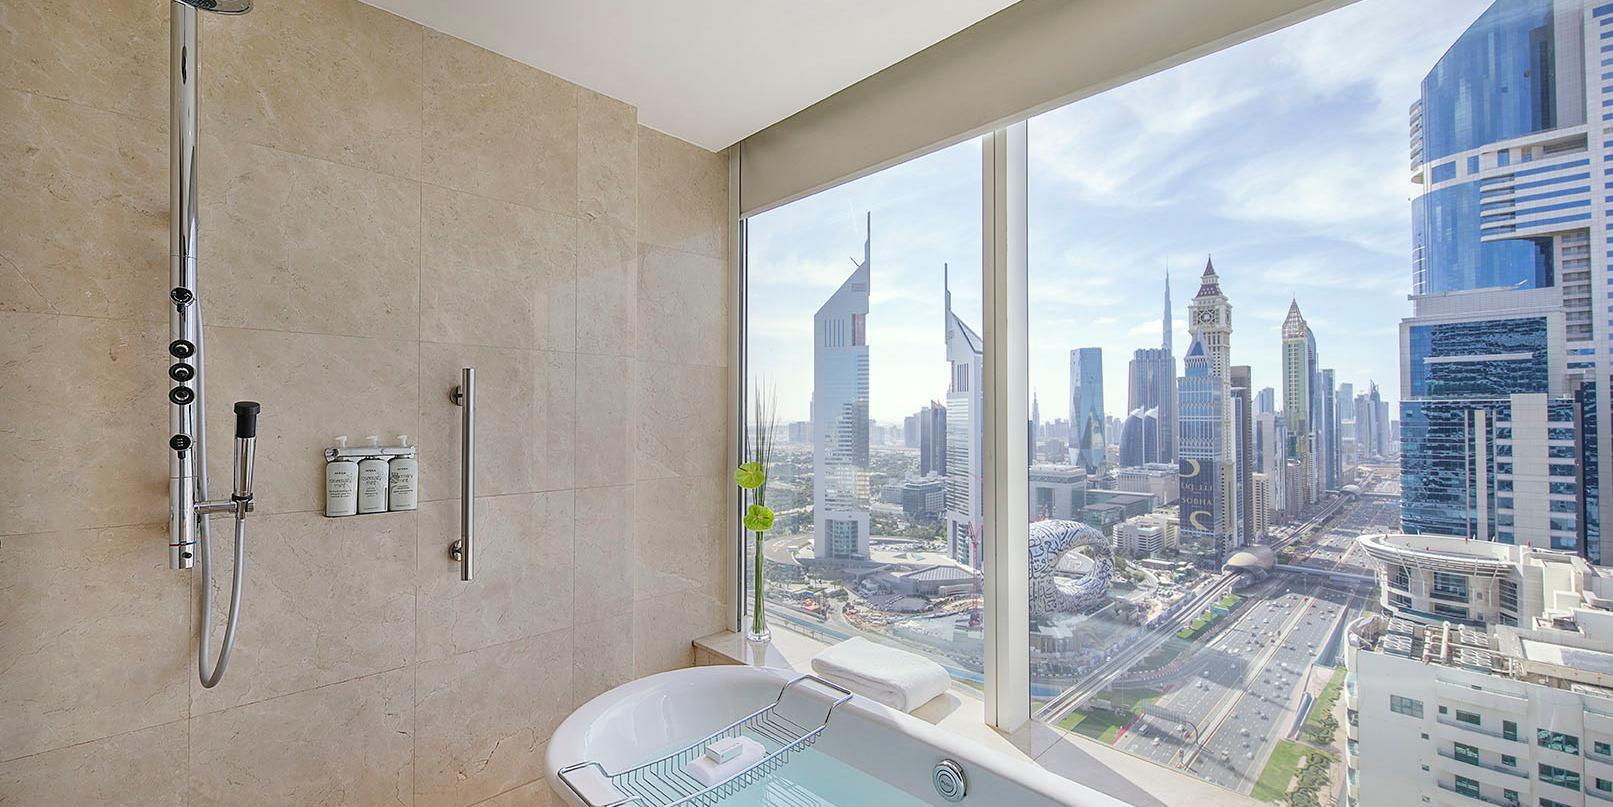 Superior Room bathroom, with Sheikh Zayed Road views, Dubai